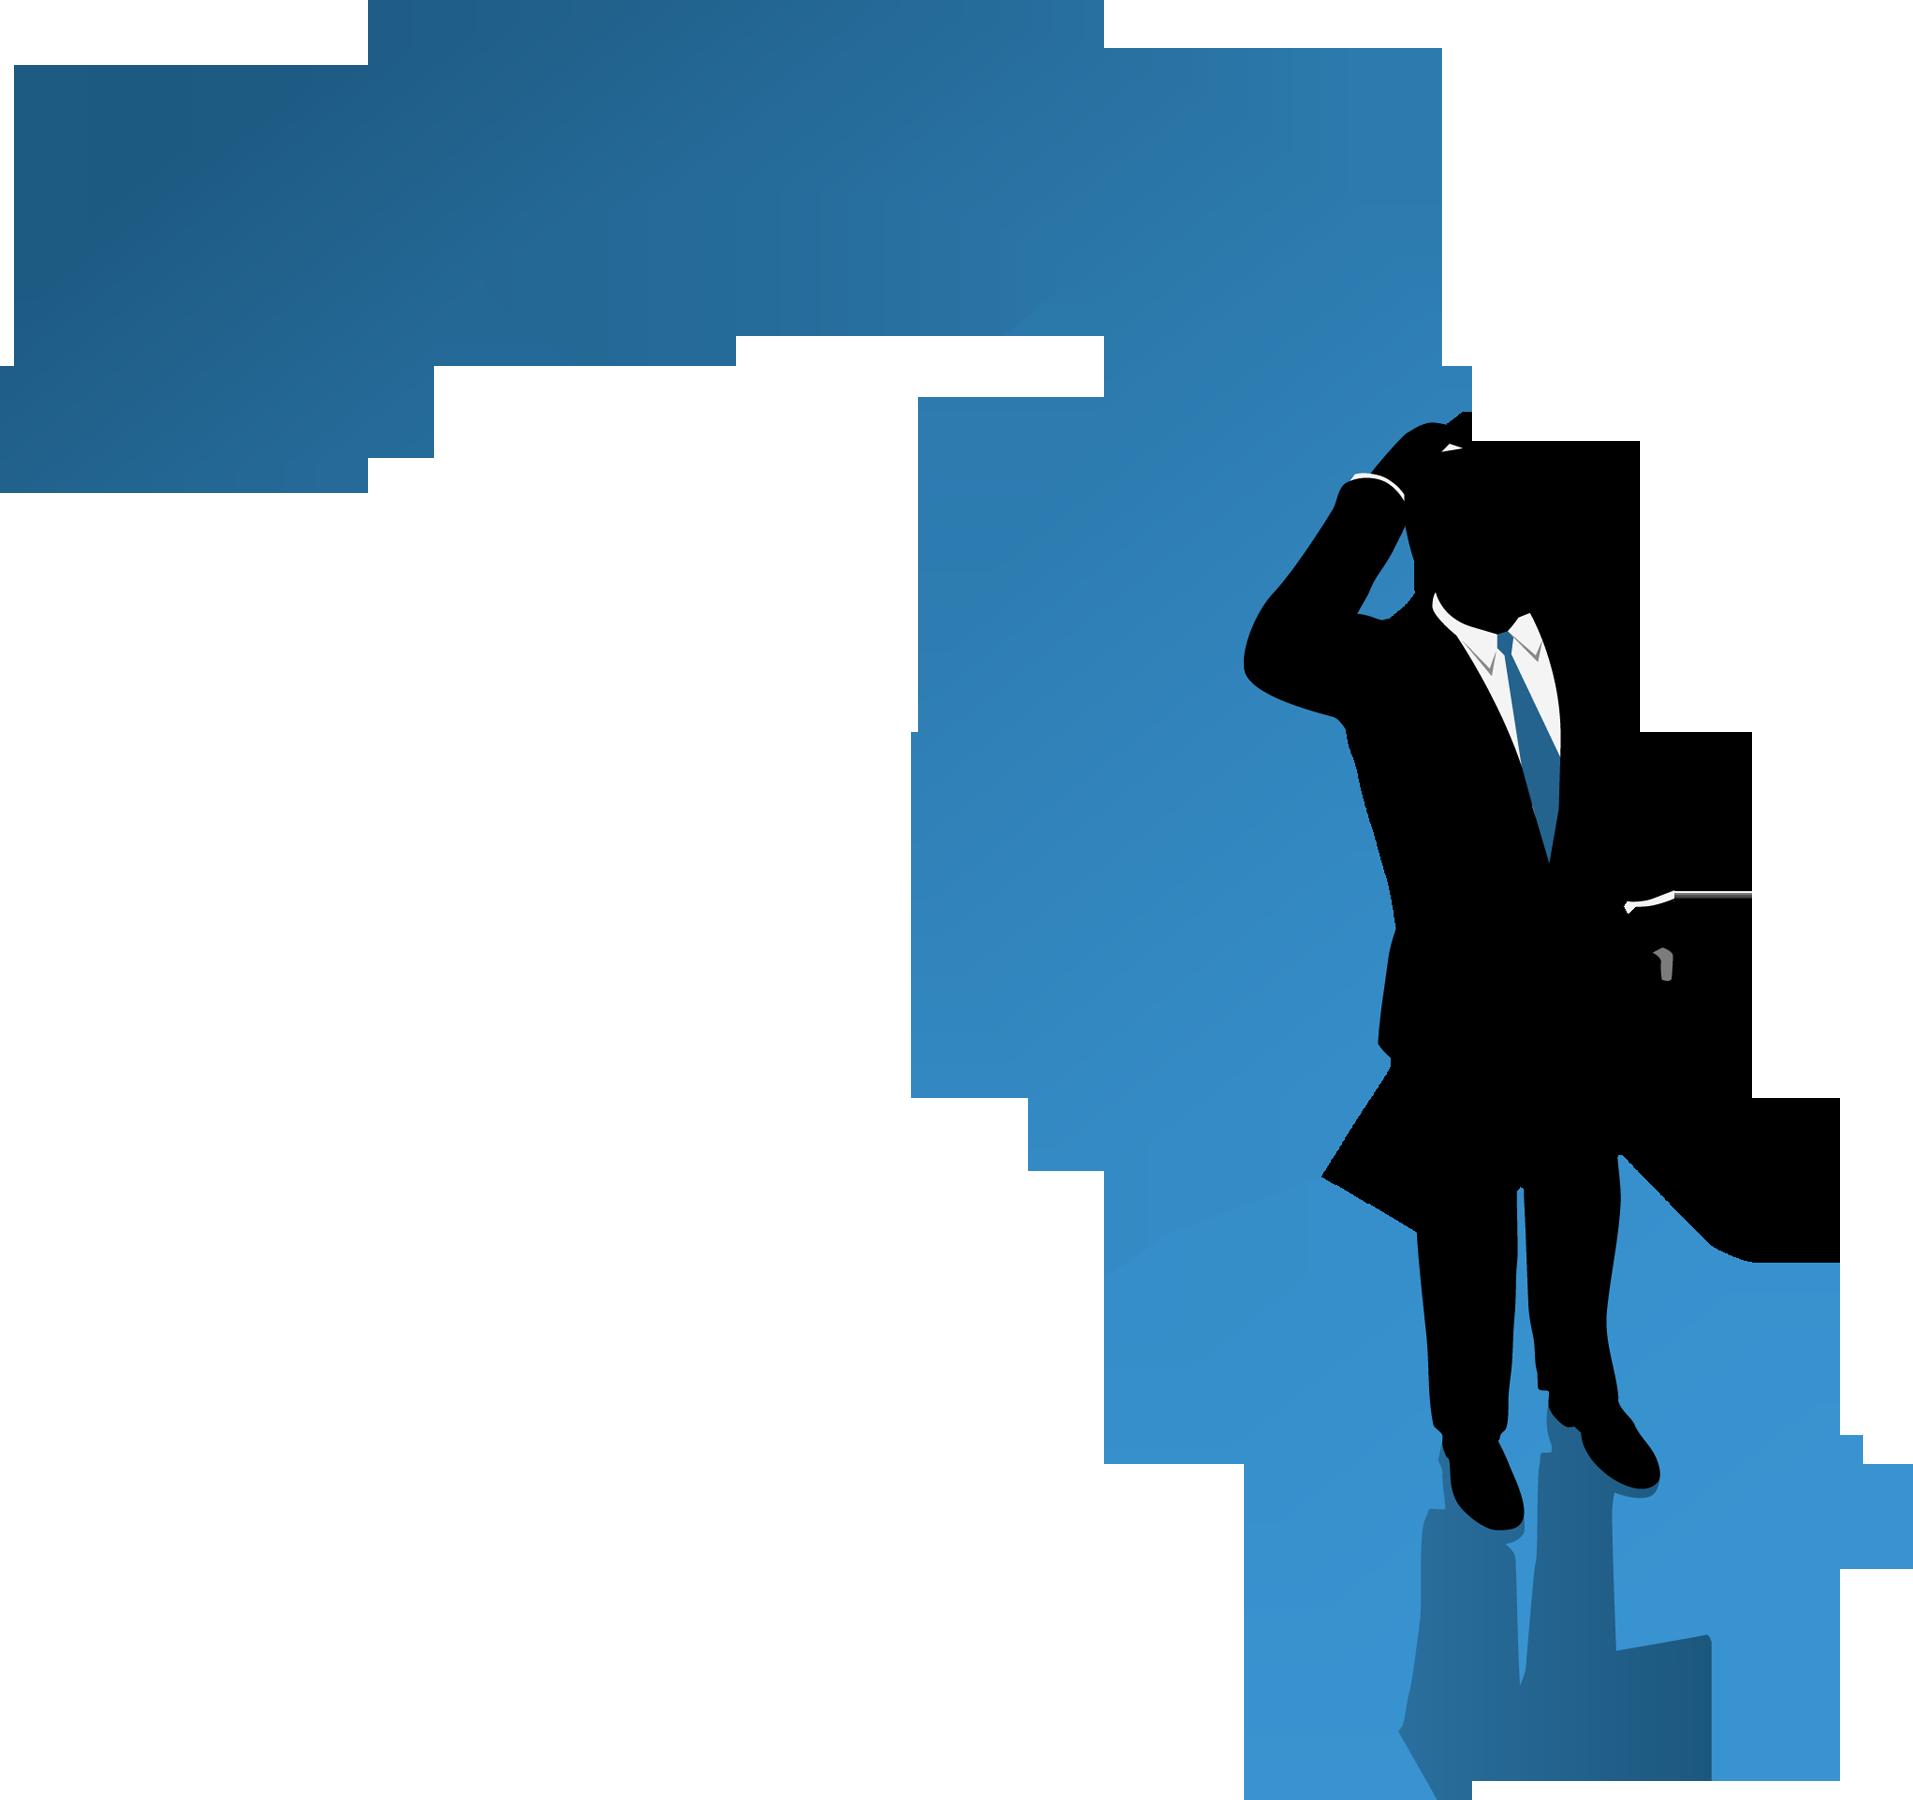 business-man-question-mark